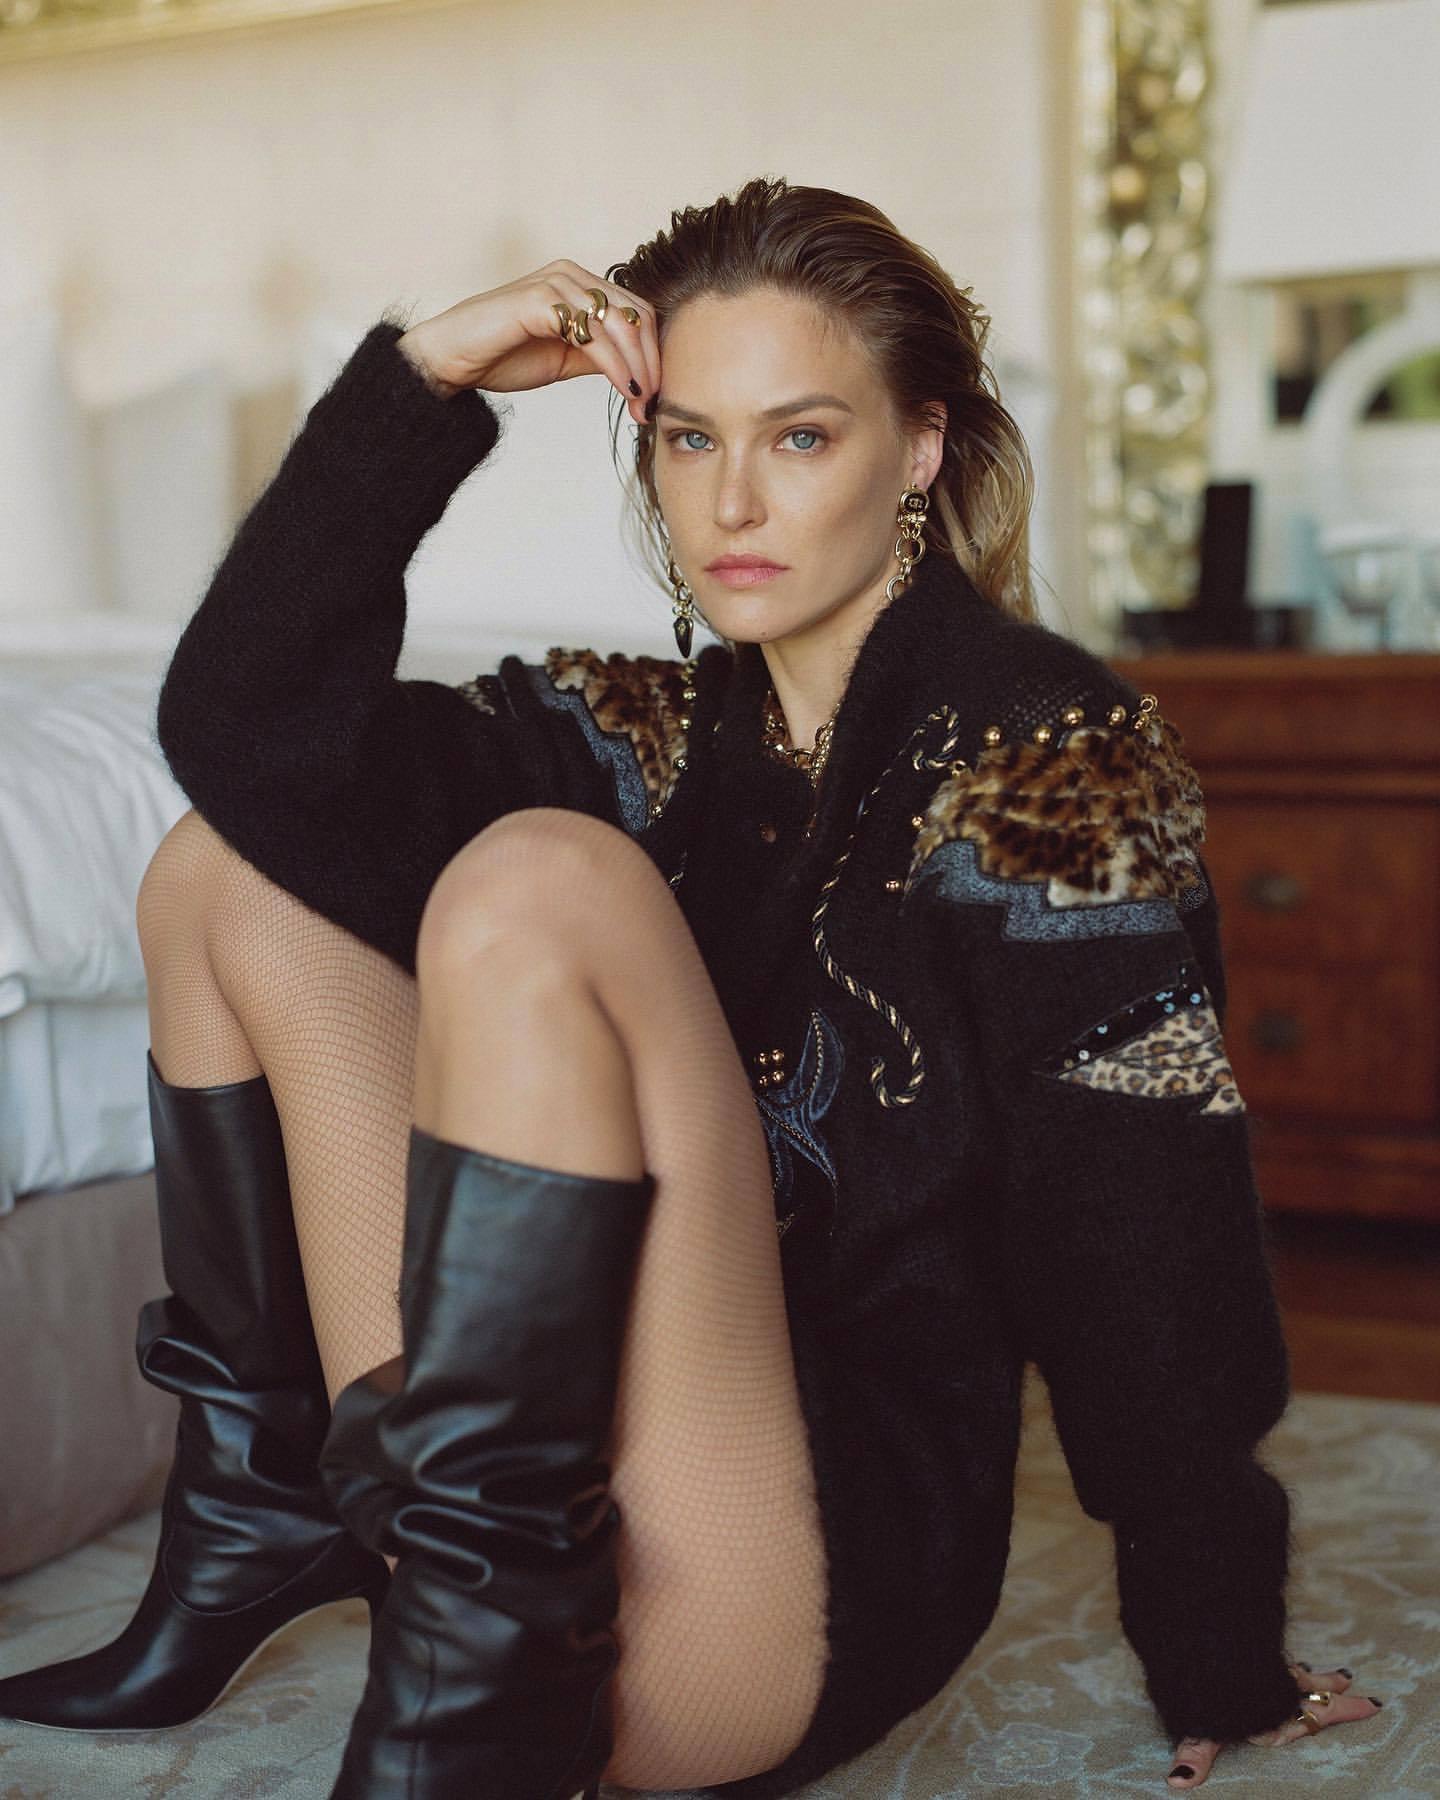 Bar Refaeli – Sexy Legs In Photoshoot For Dodo Bar Or Clothing Line 0003